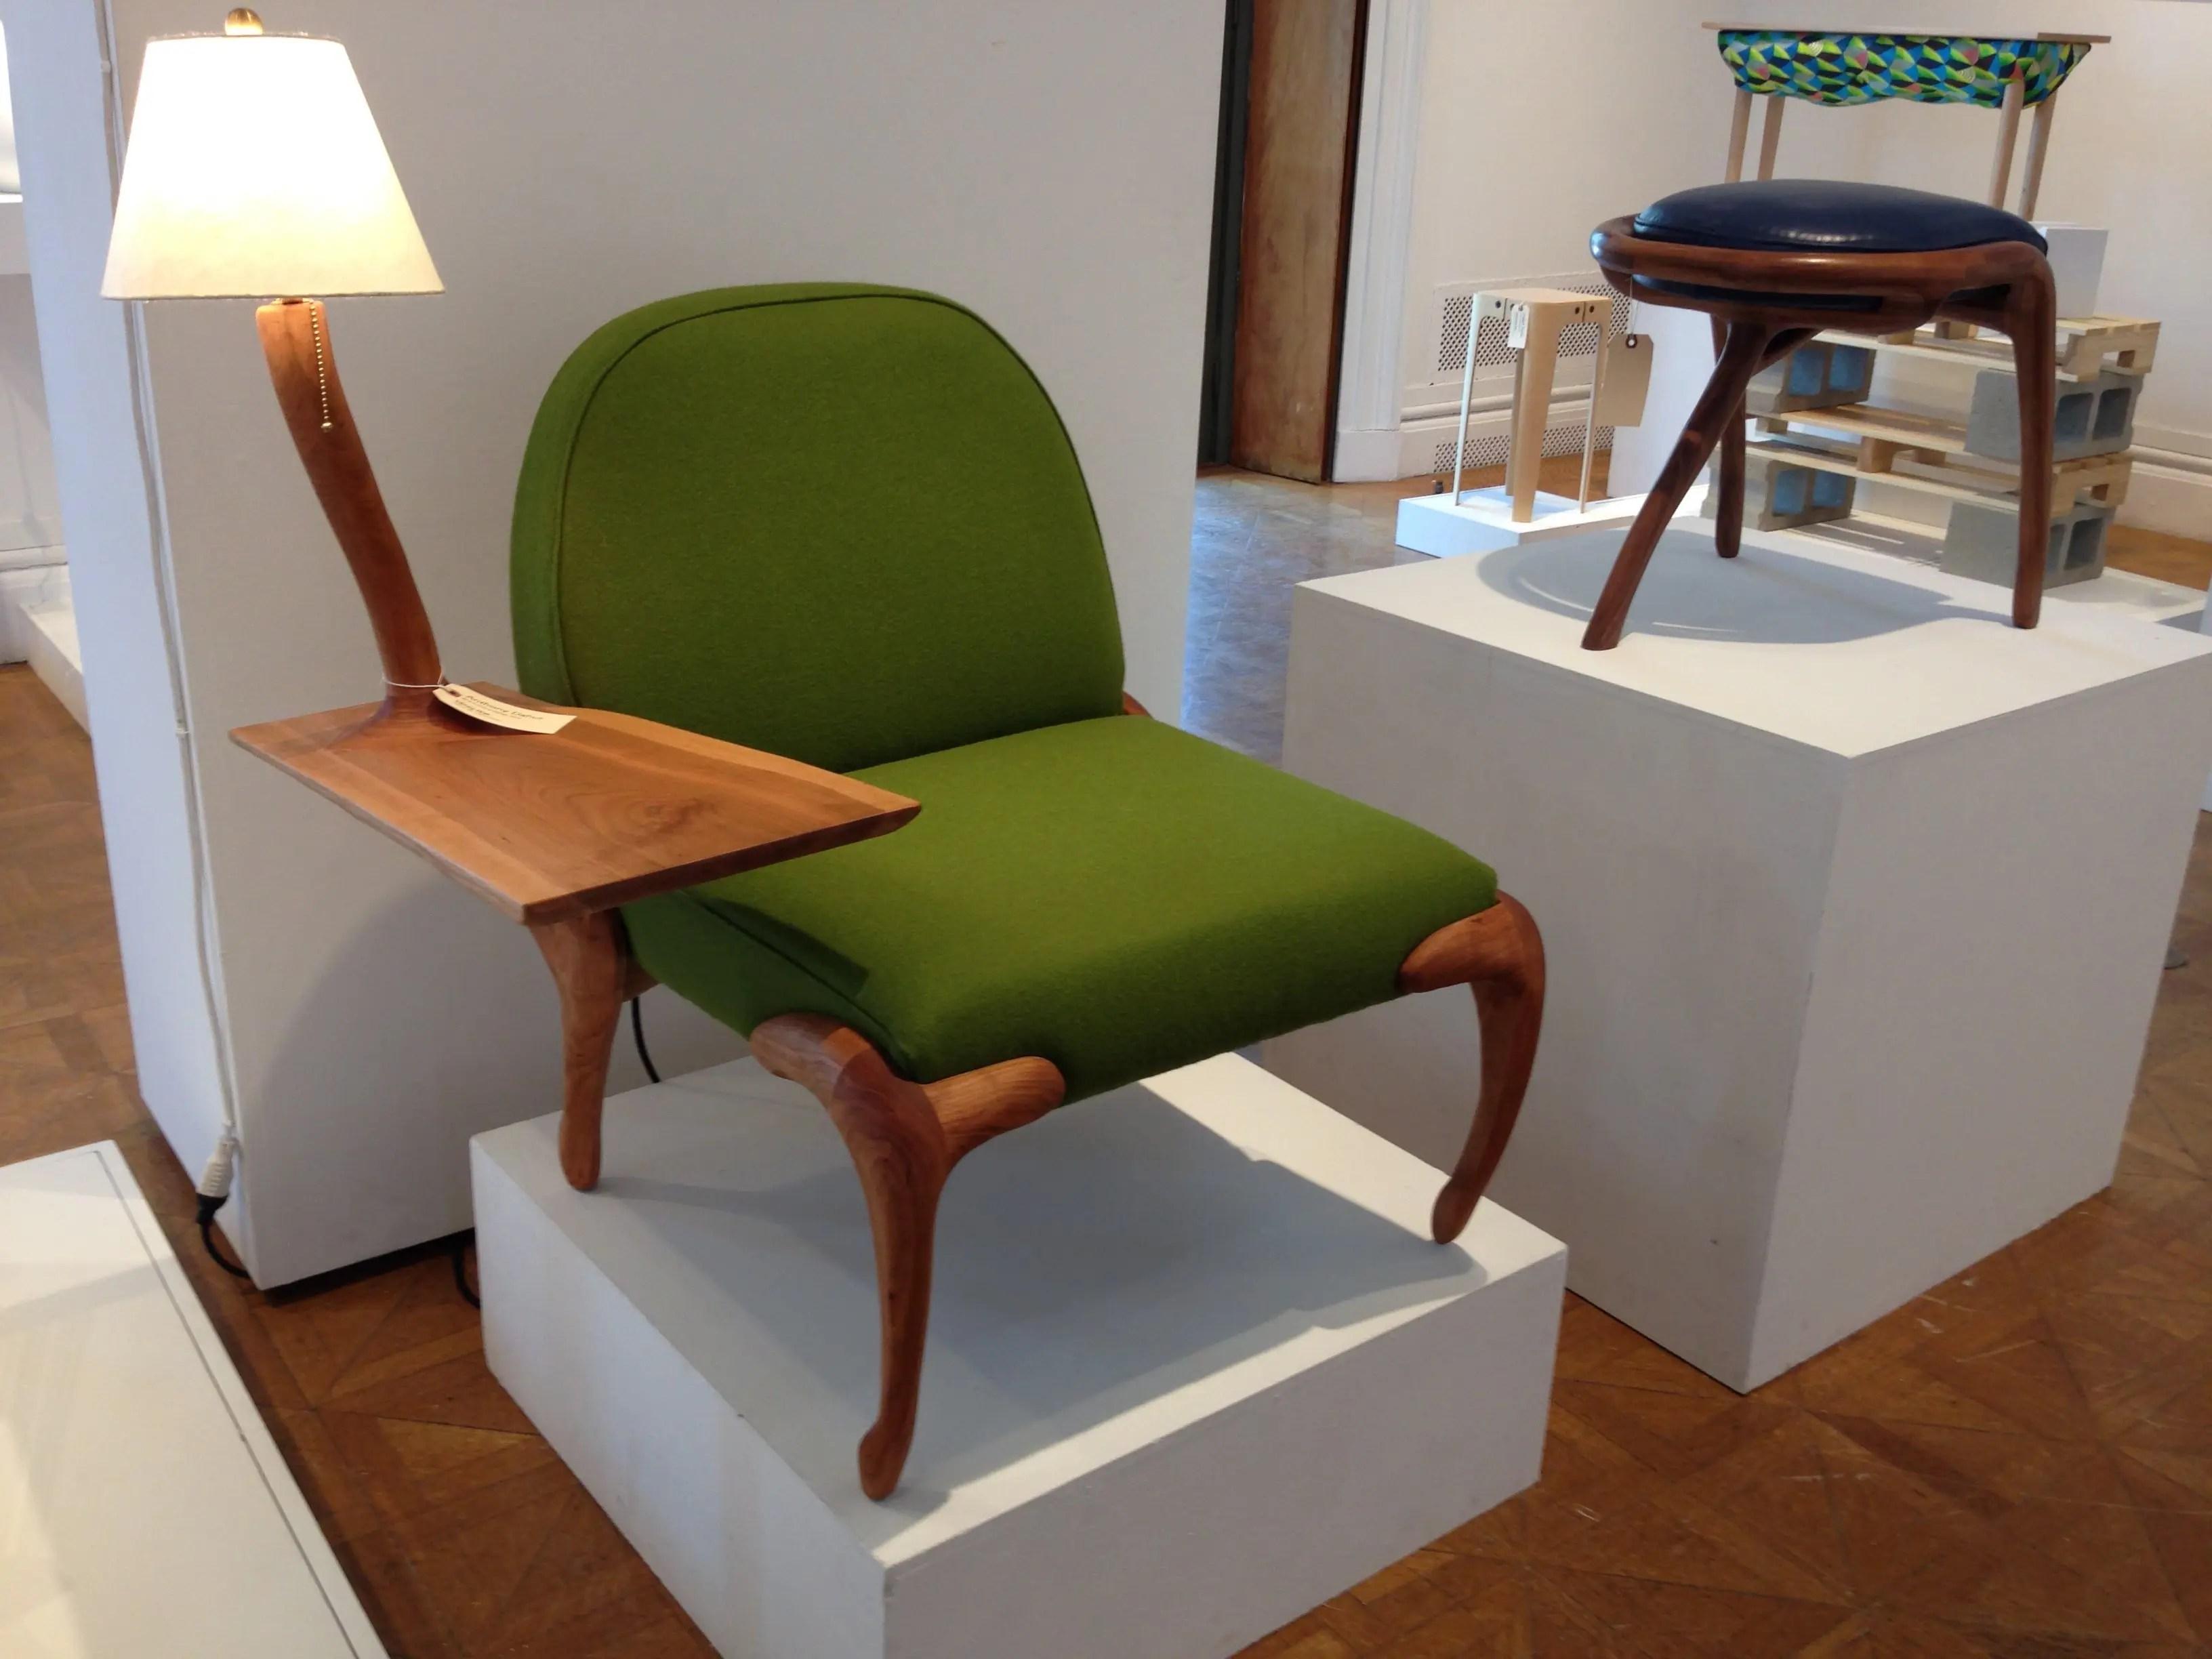 chair design for elderly black covers brisbane risd seniors furniture at woods gerry providence